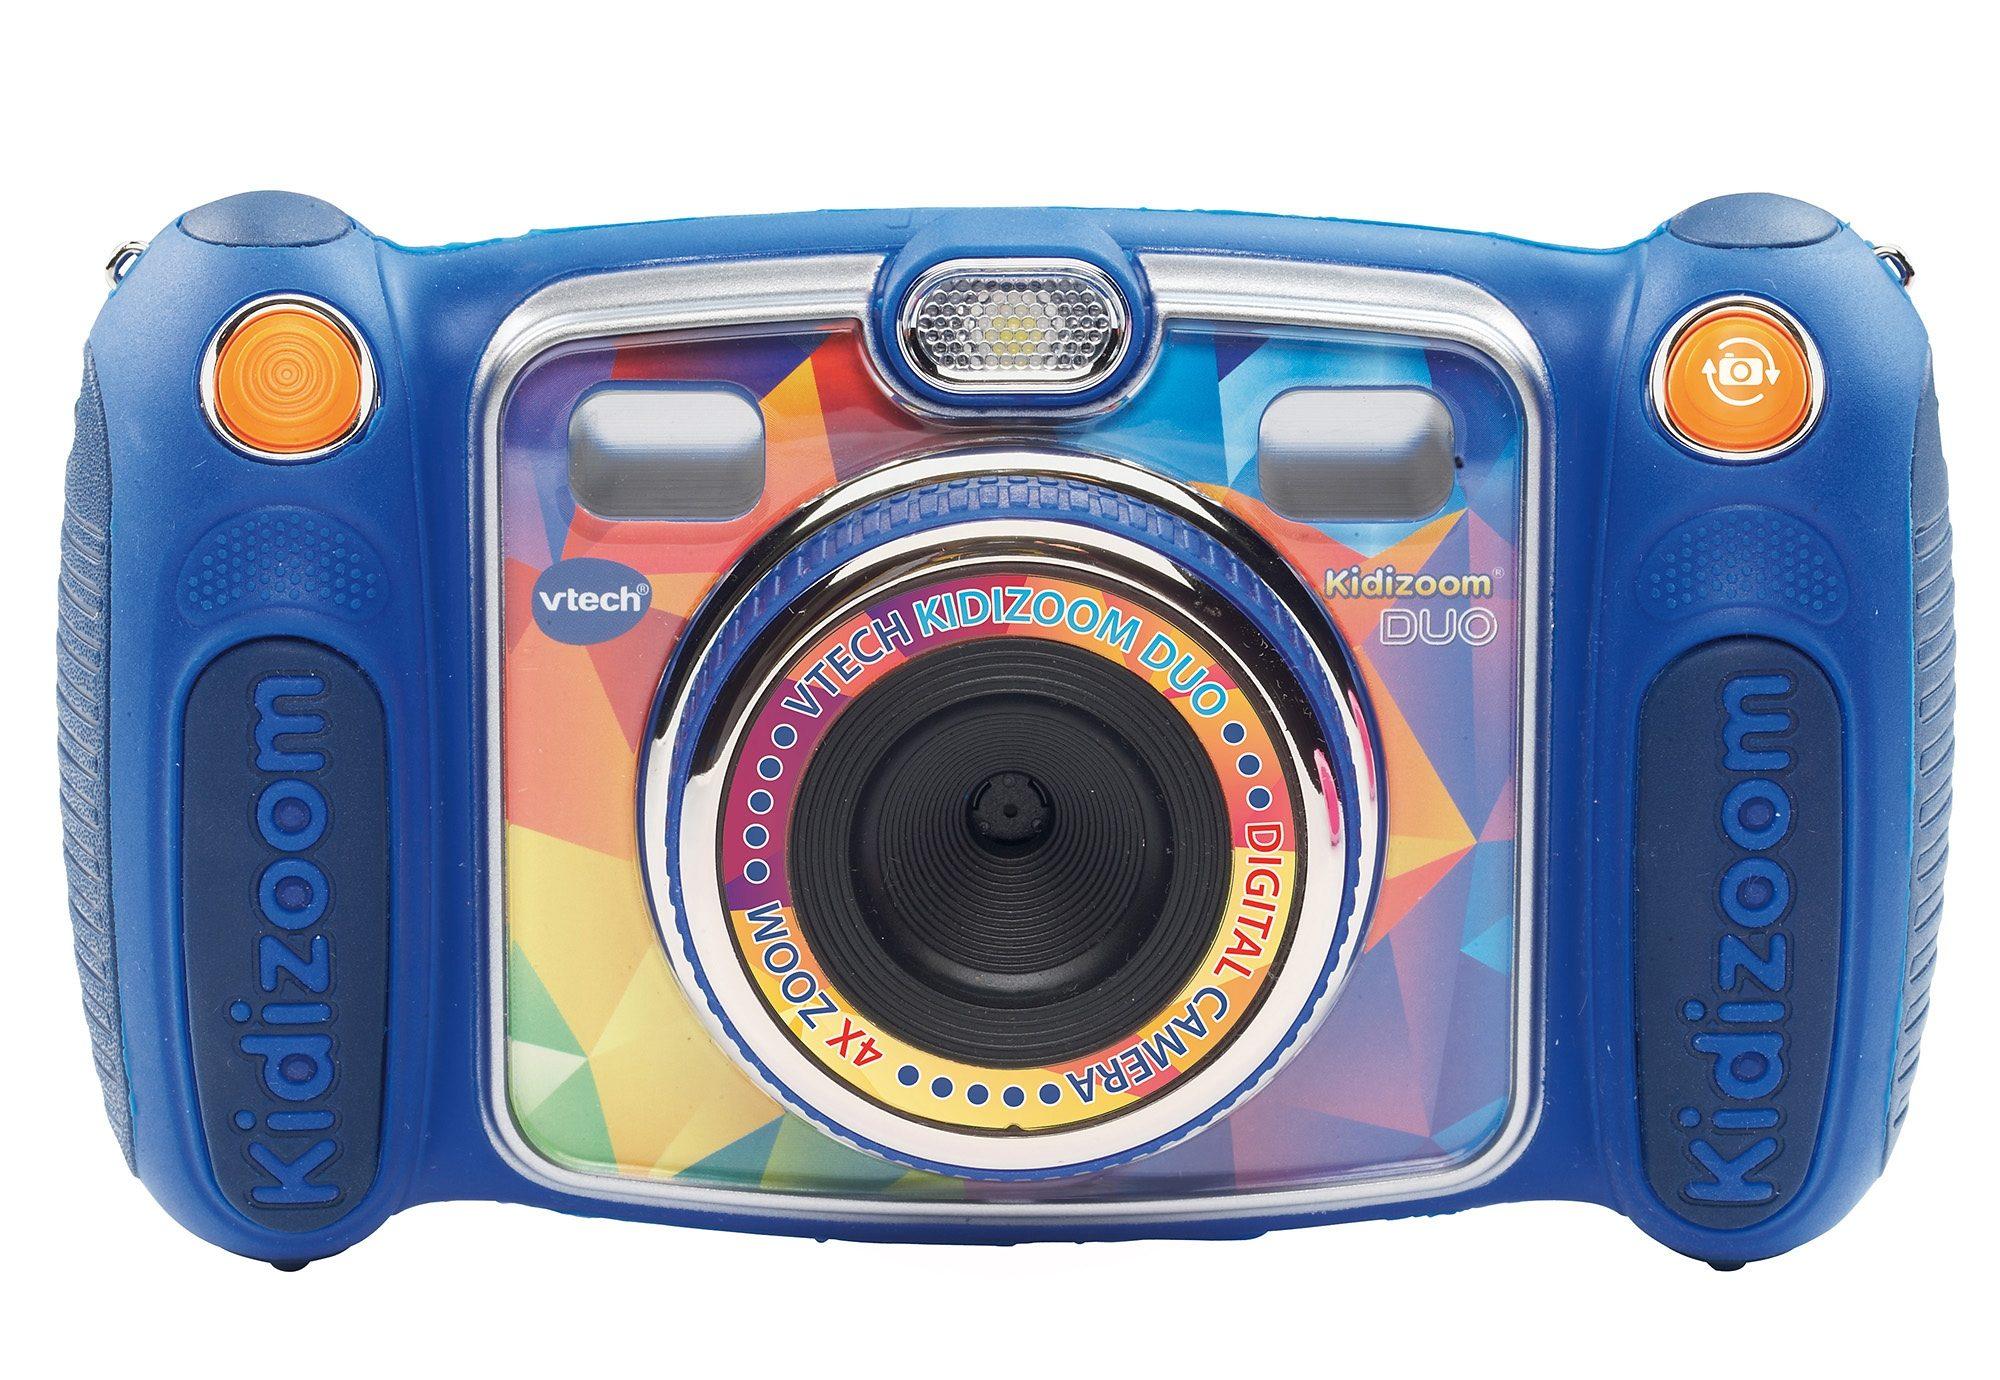 VTech Digitalkamera, »Kidizoom DUO - blau«